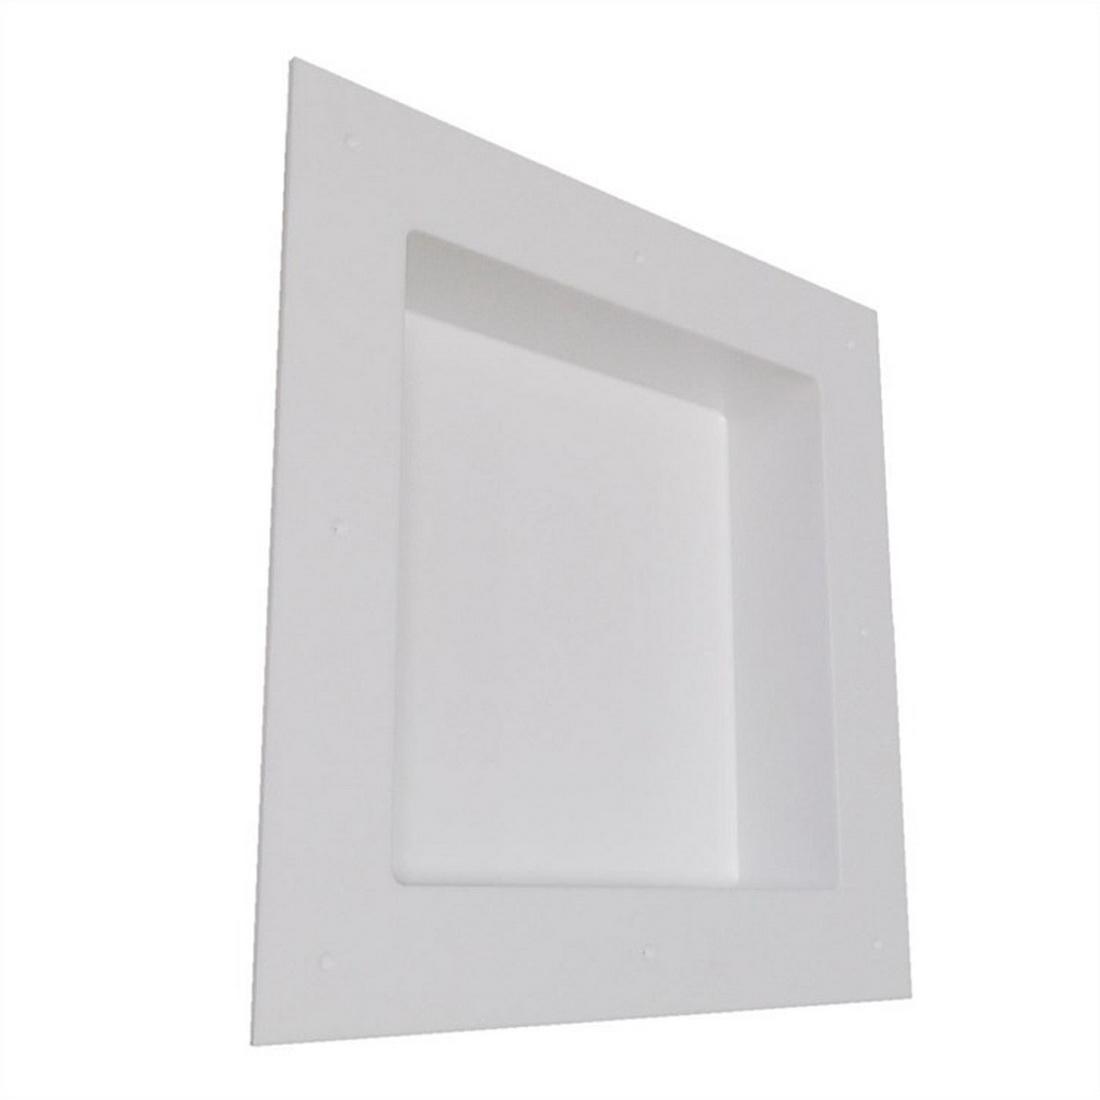 Easy Niche Square Solid Waterproofing Shelf 340 x 340mm